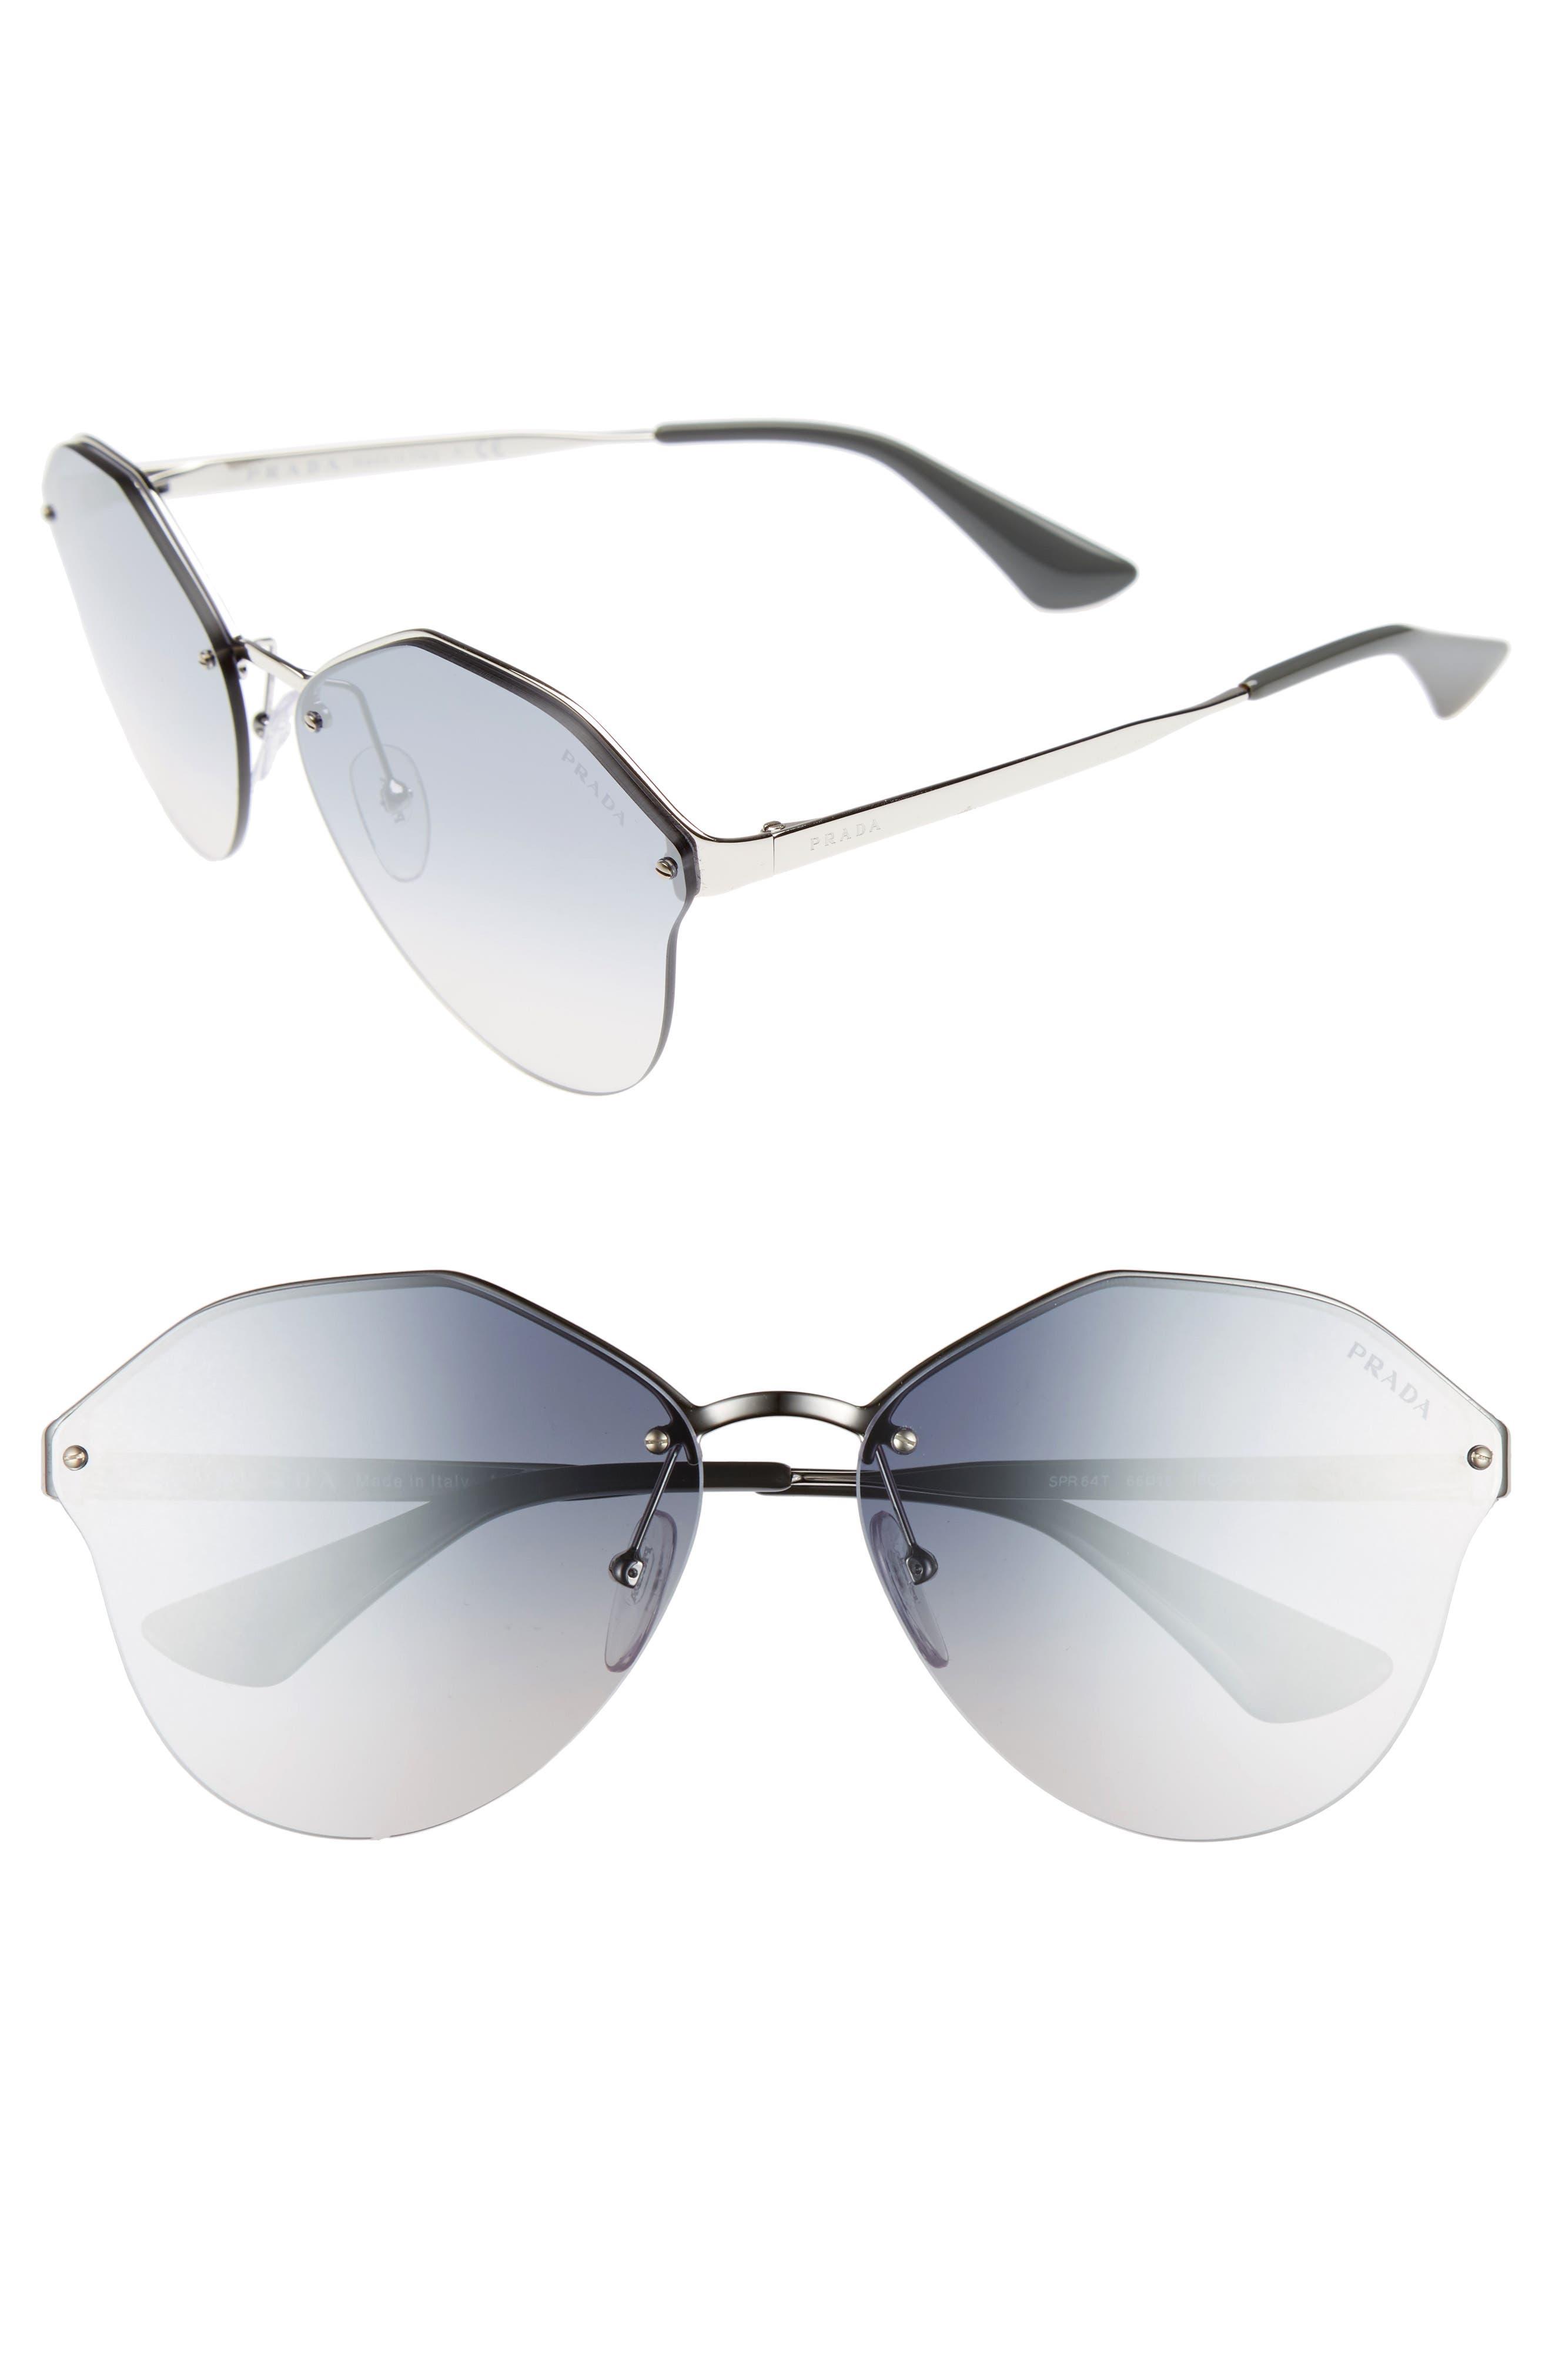 66mm Gradient Rimless Sunglasses,                         Main,                         color, 040